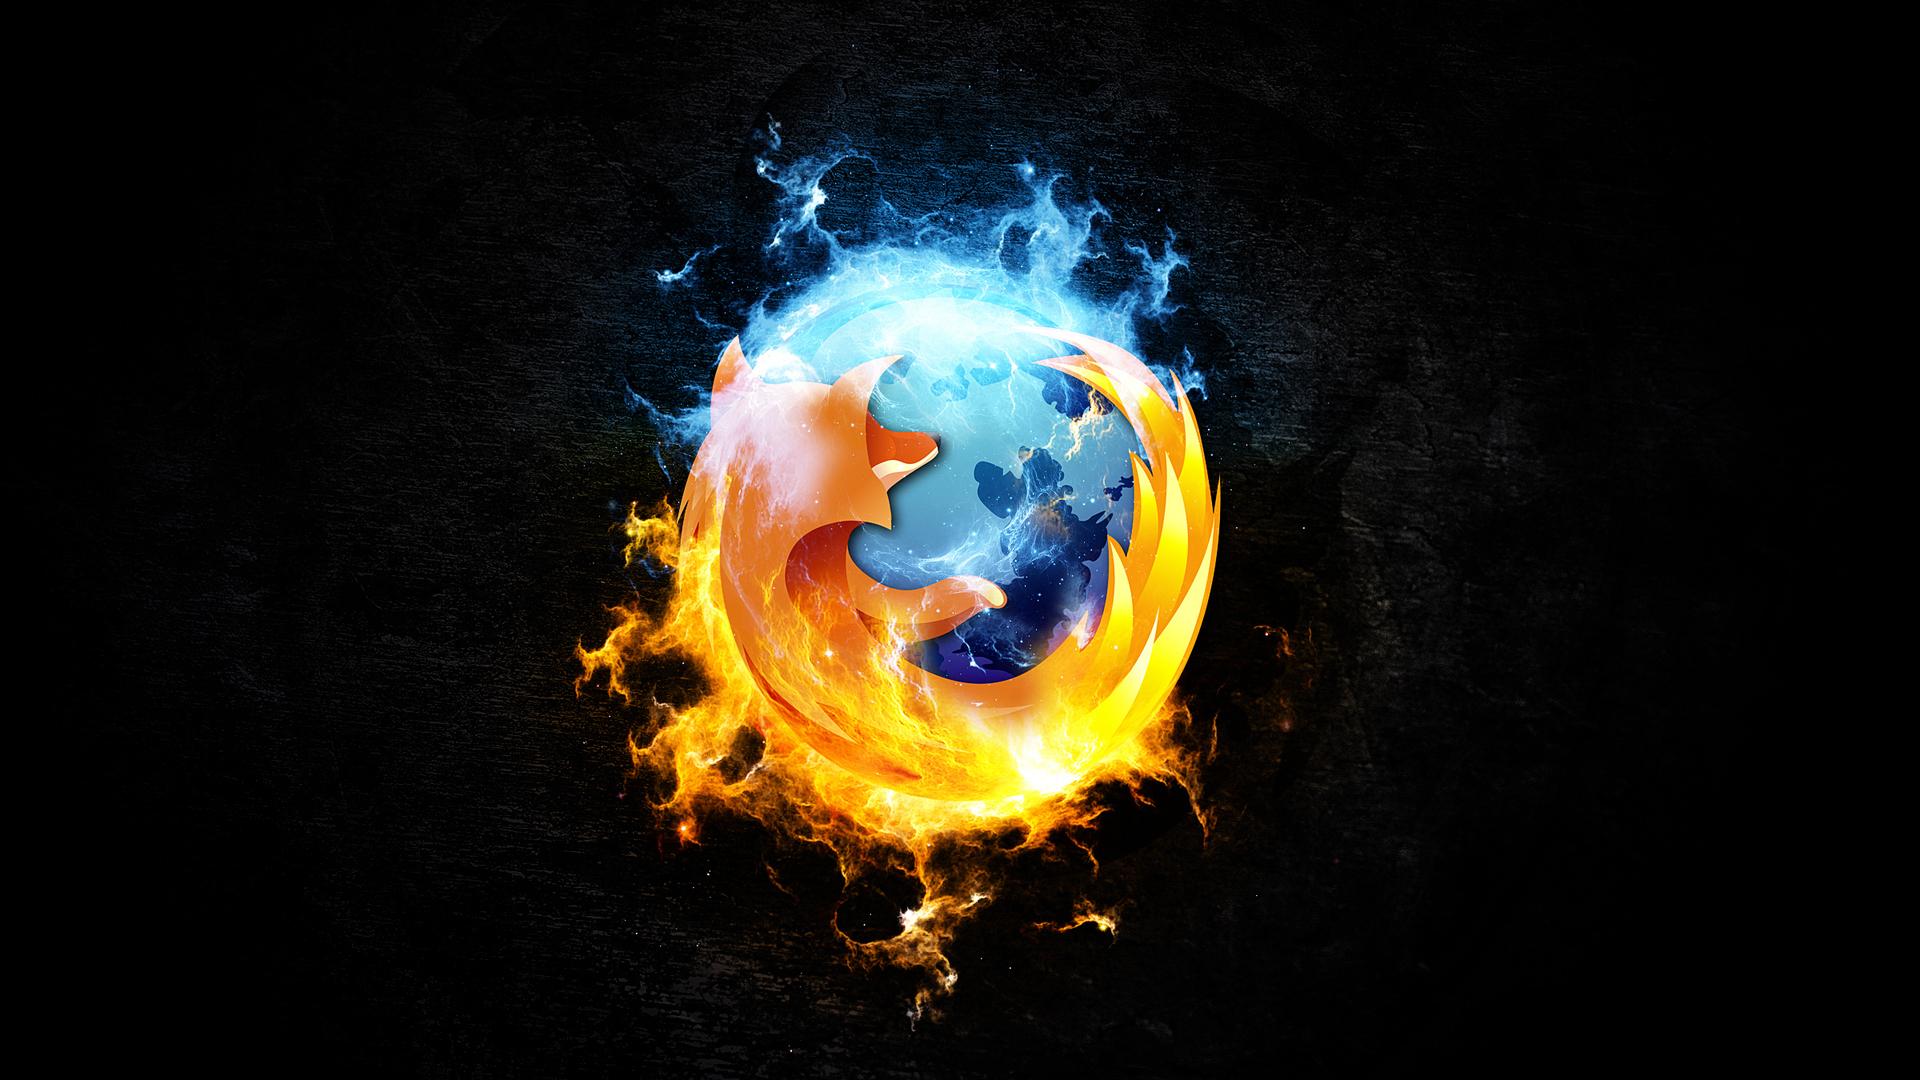 ... інформації в користувачів Mozilla Firefox: osvita.mediasapiens.ua/web/cybersecurity/na_rosiyskomu_sayti_novin...